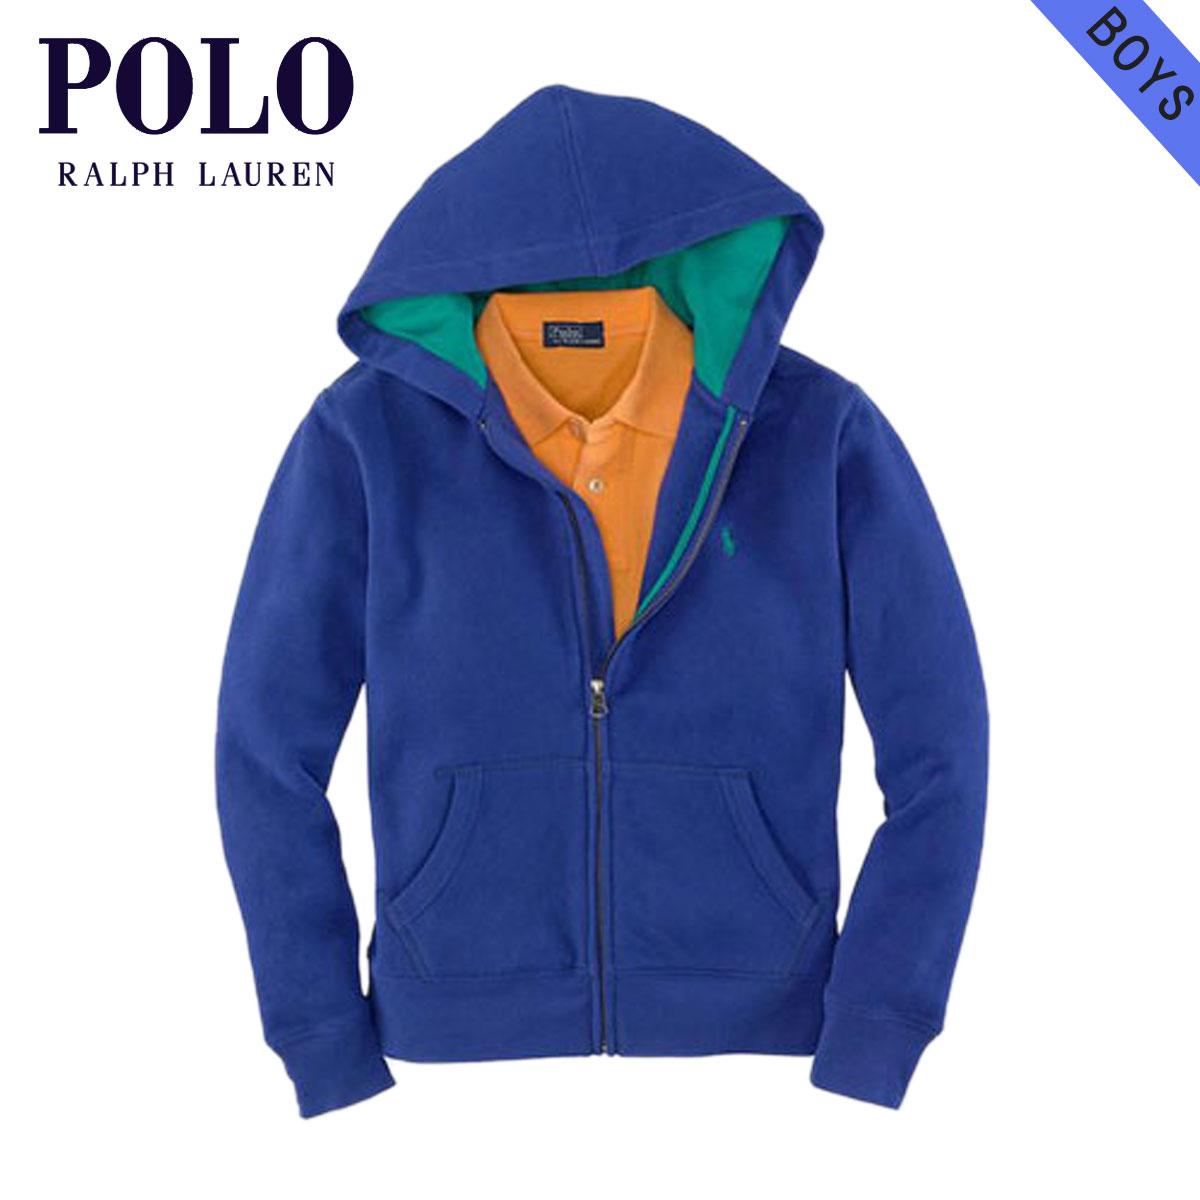 9955b34a9 Rakuten Ichiba shop MIXON  Polo Ralph Lauren kids POLO RALPH LAUREN  CHILDREN regular article children s clothes Boys parka Full-Zip Pony Hoodie   17535466 ...